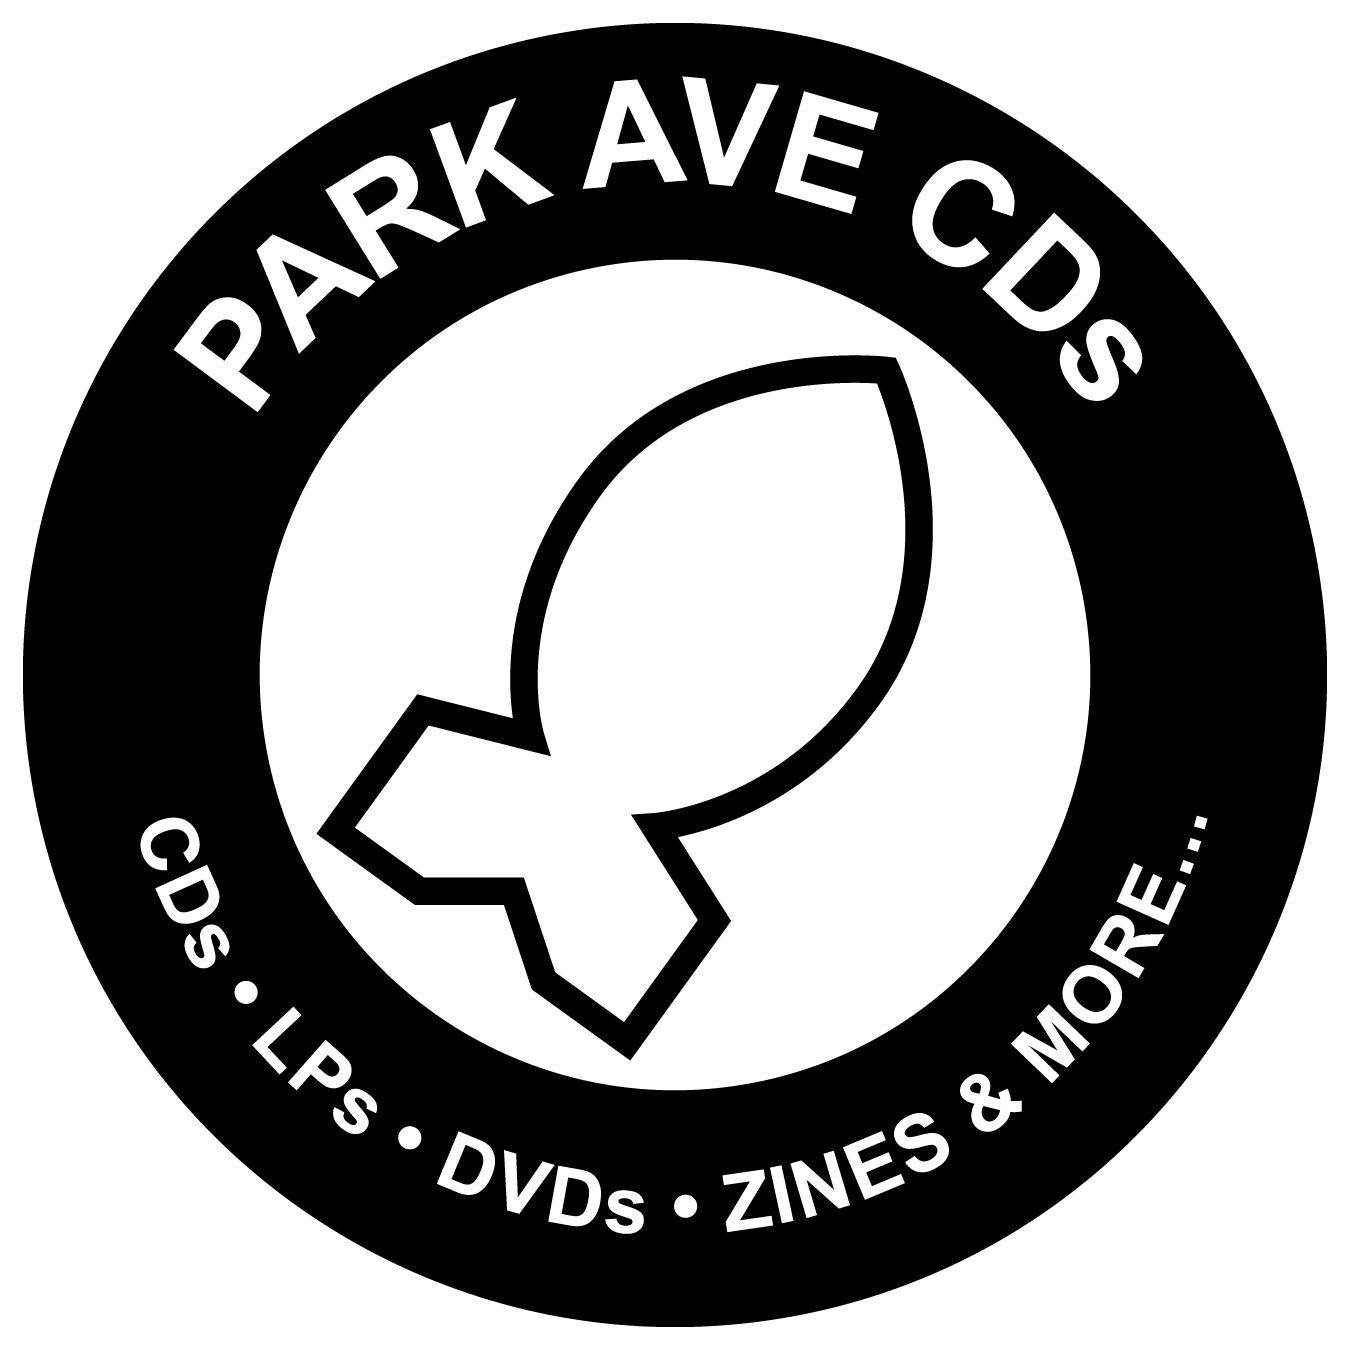 pacd_logo